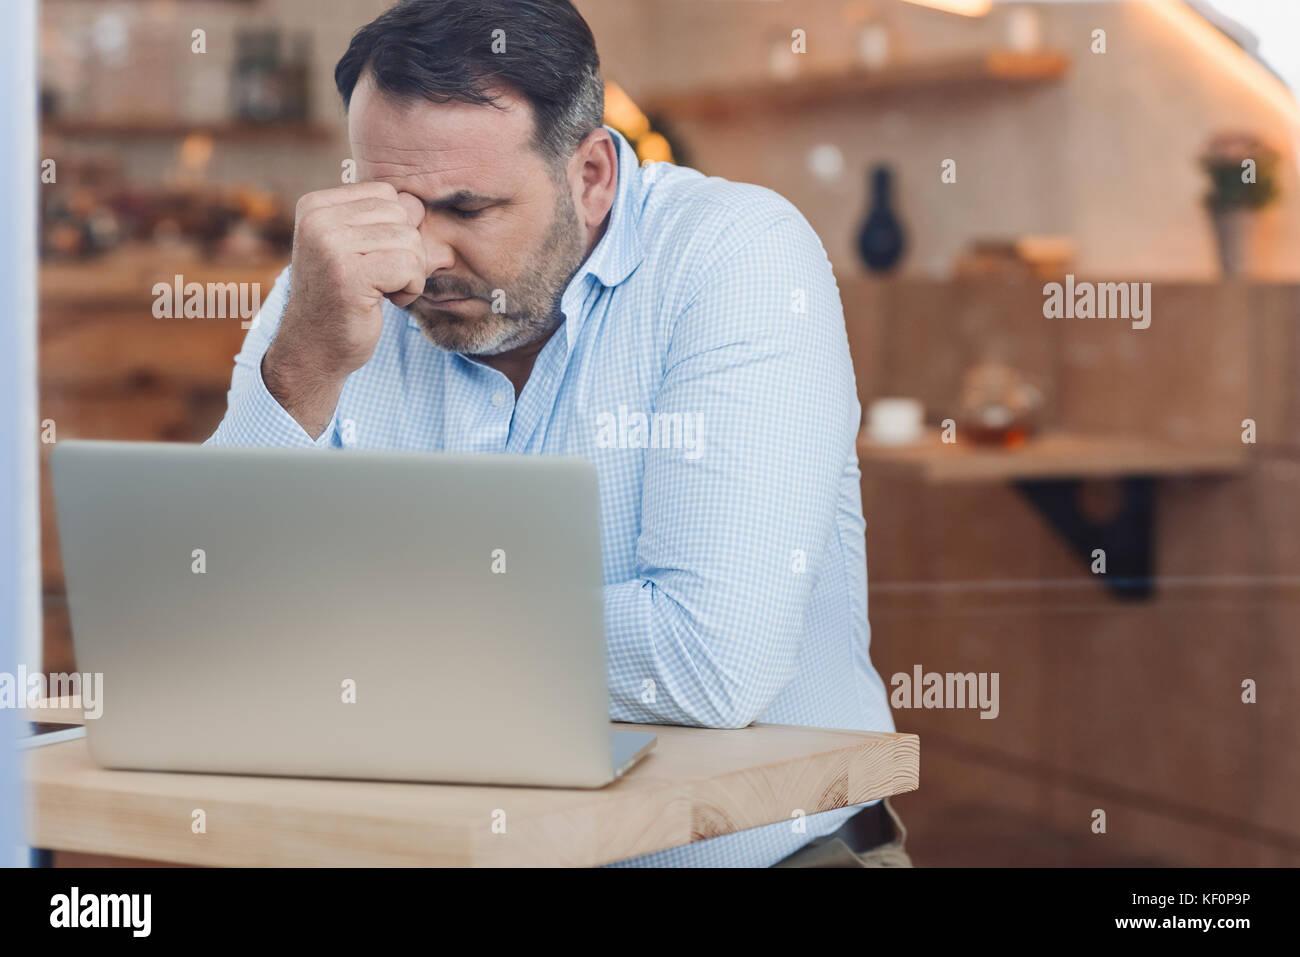 Deprimiert Geschäftsmann mit Laptop Stockbild